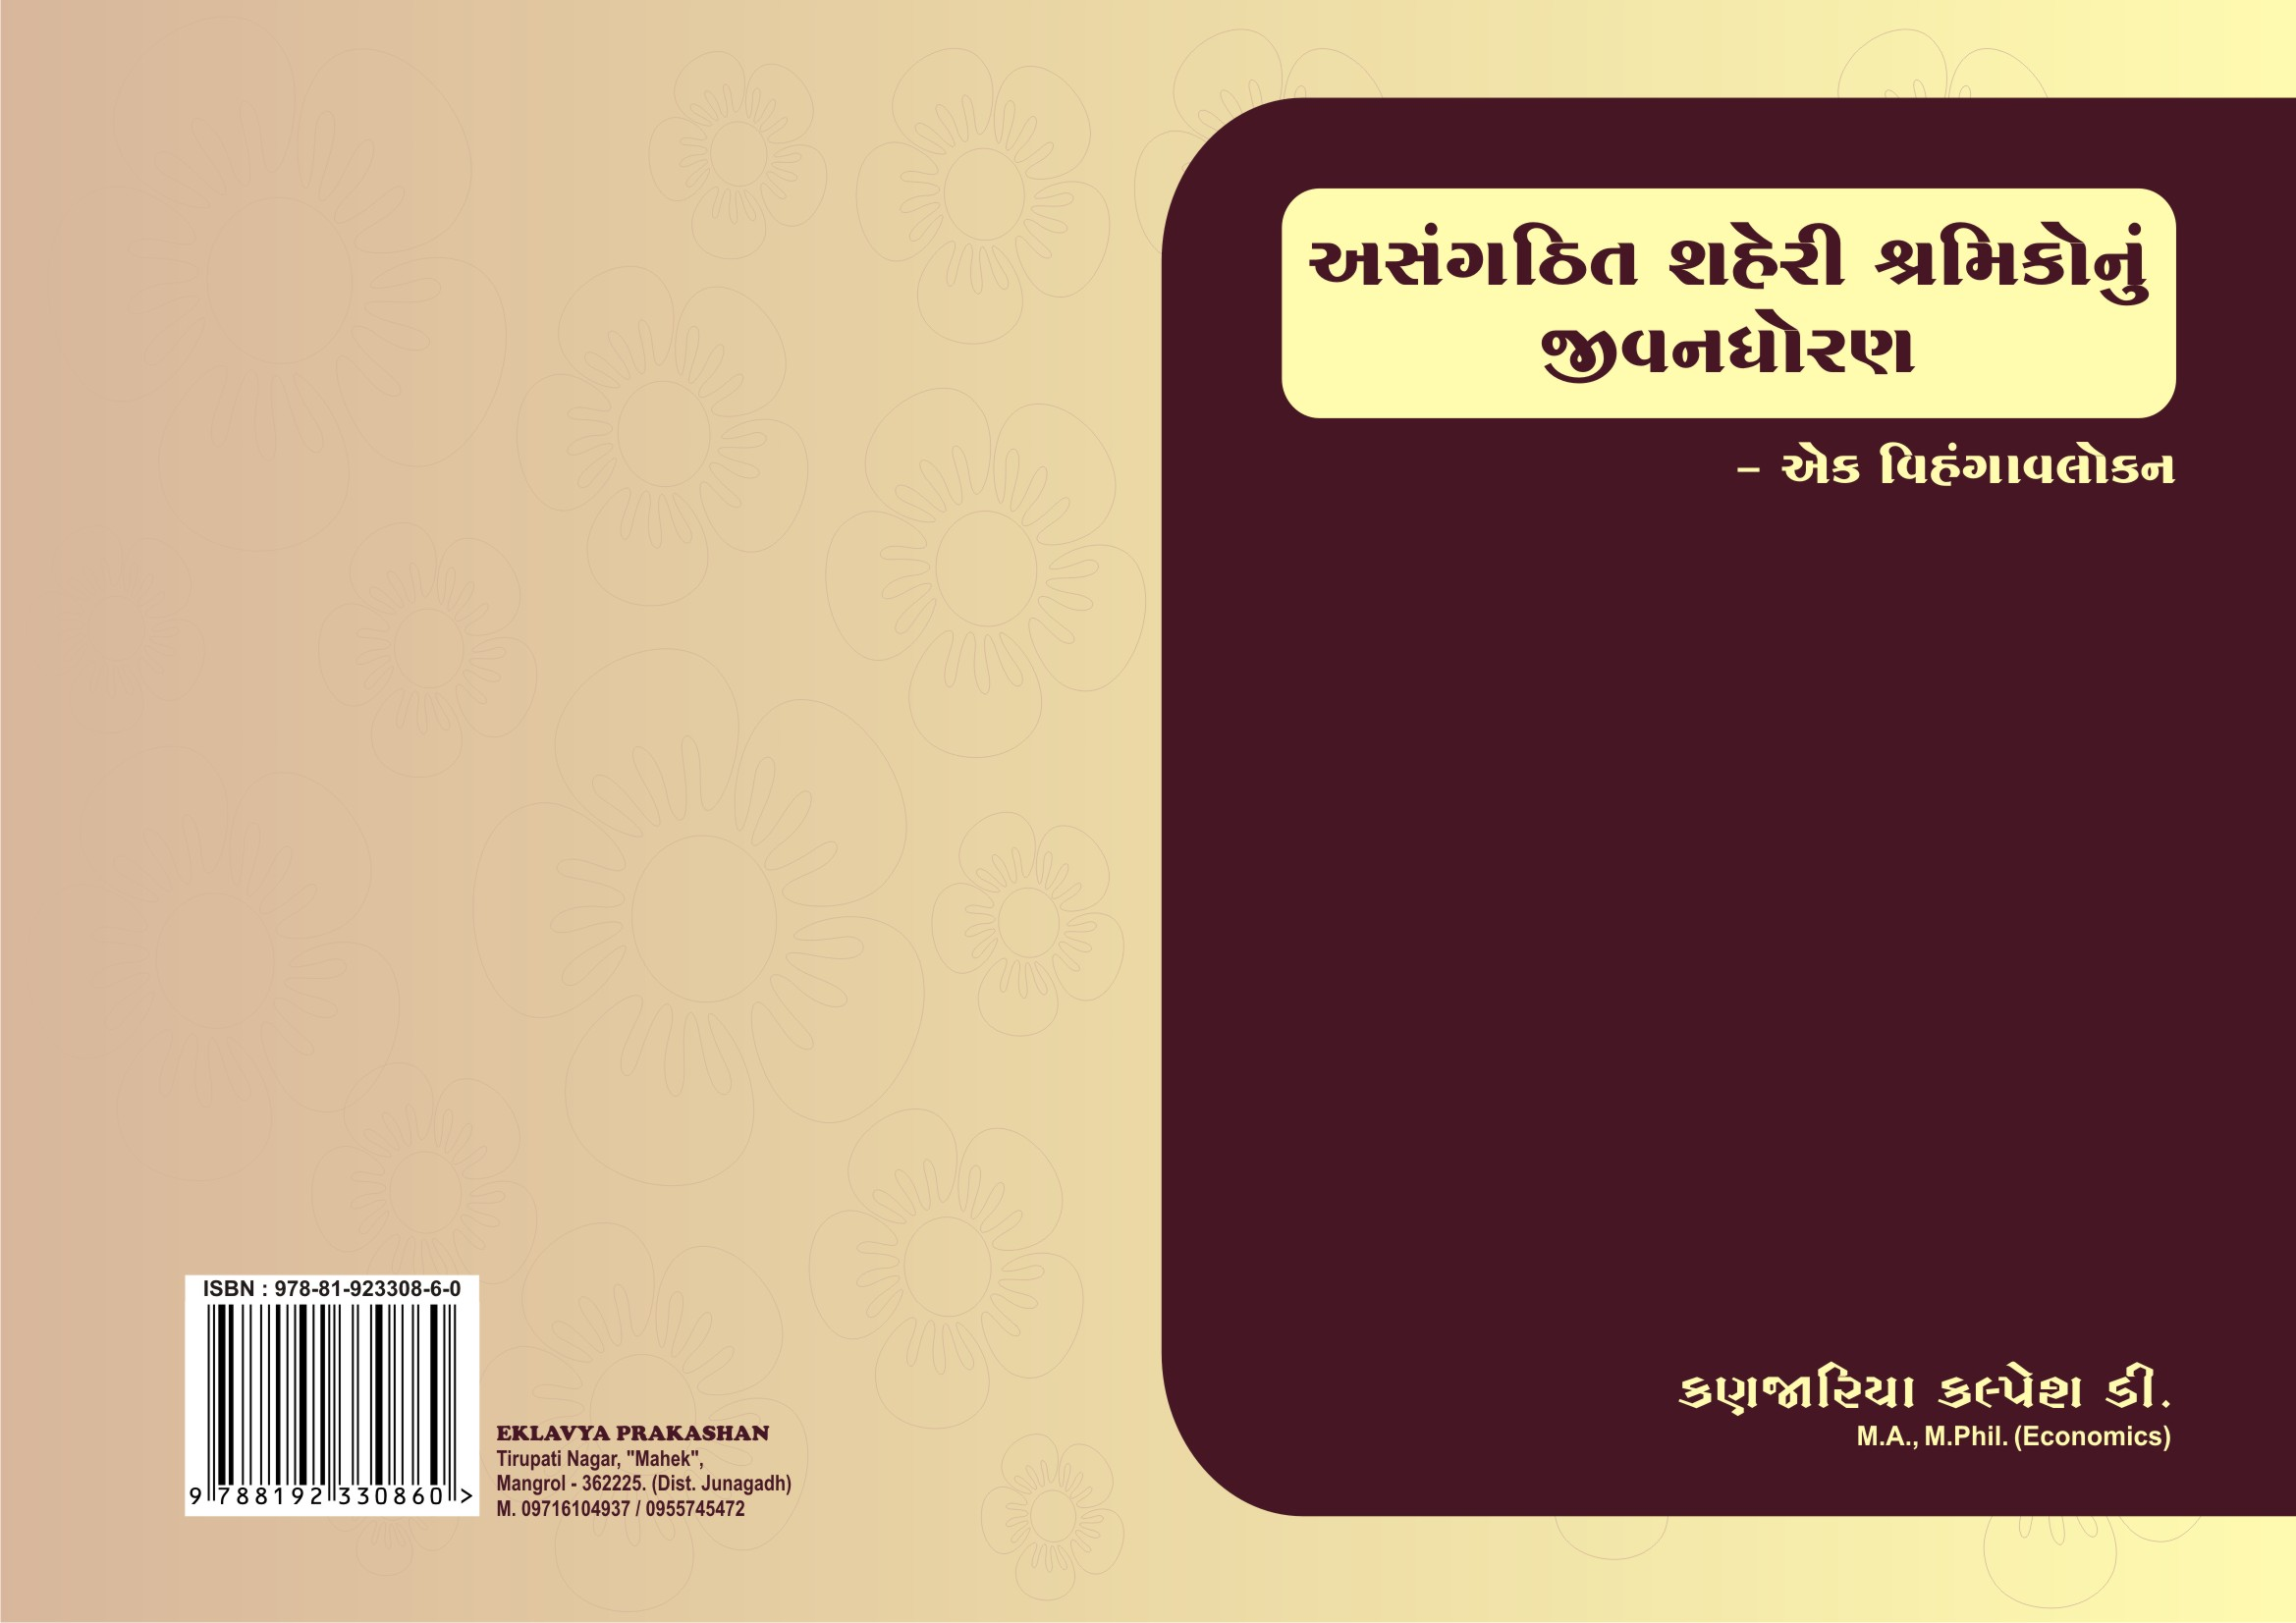 Asangthit shaheri shramikonu jivandhoran ebook readaudio id2u6xgvu fandeluxe Gallery